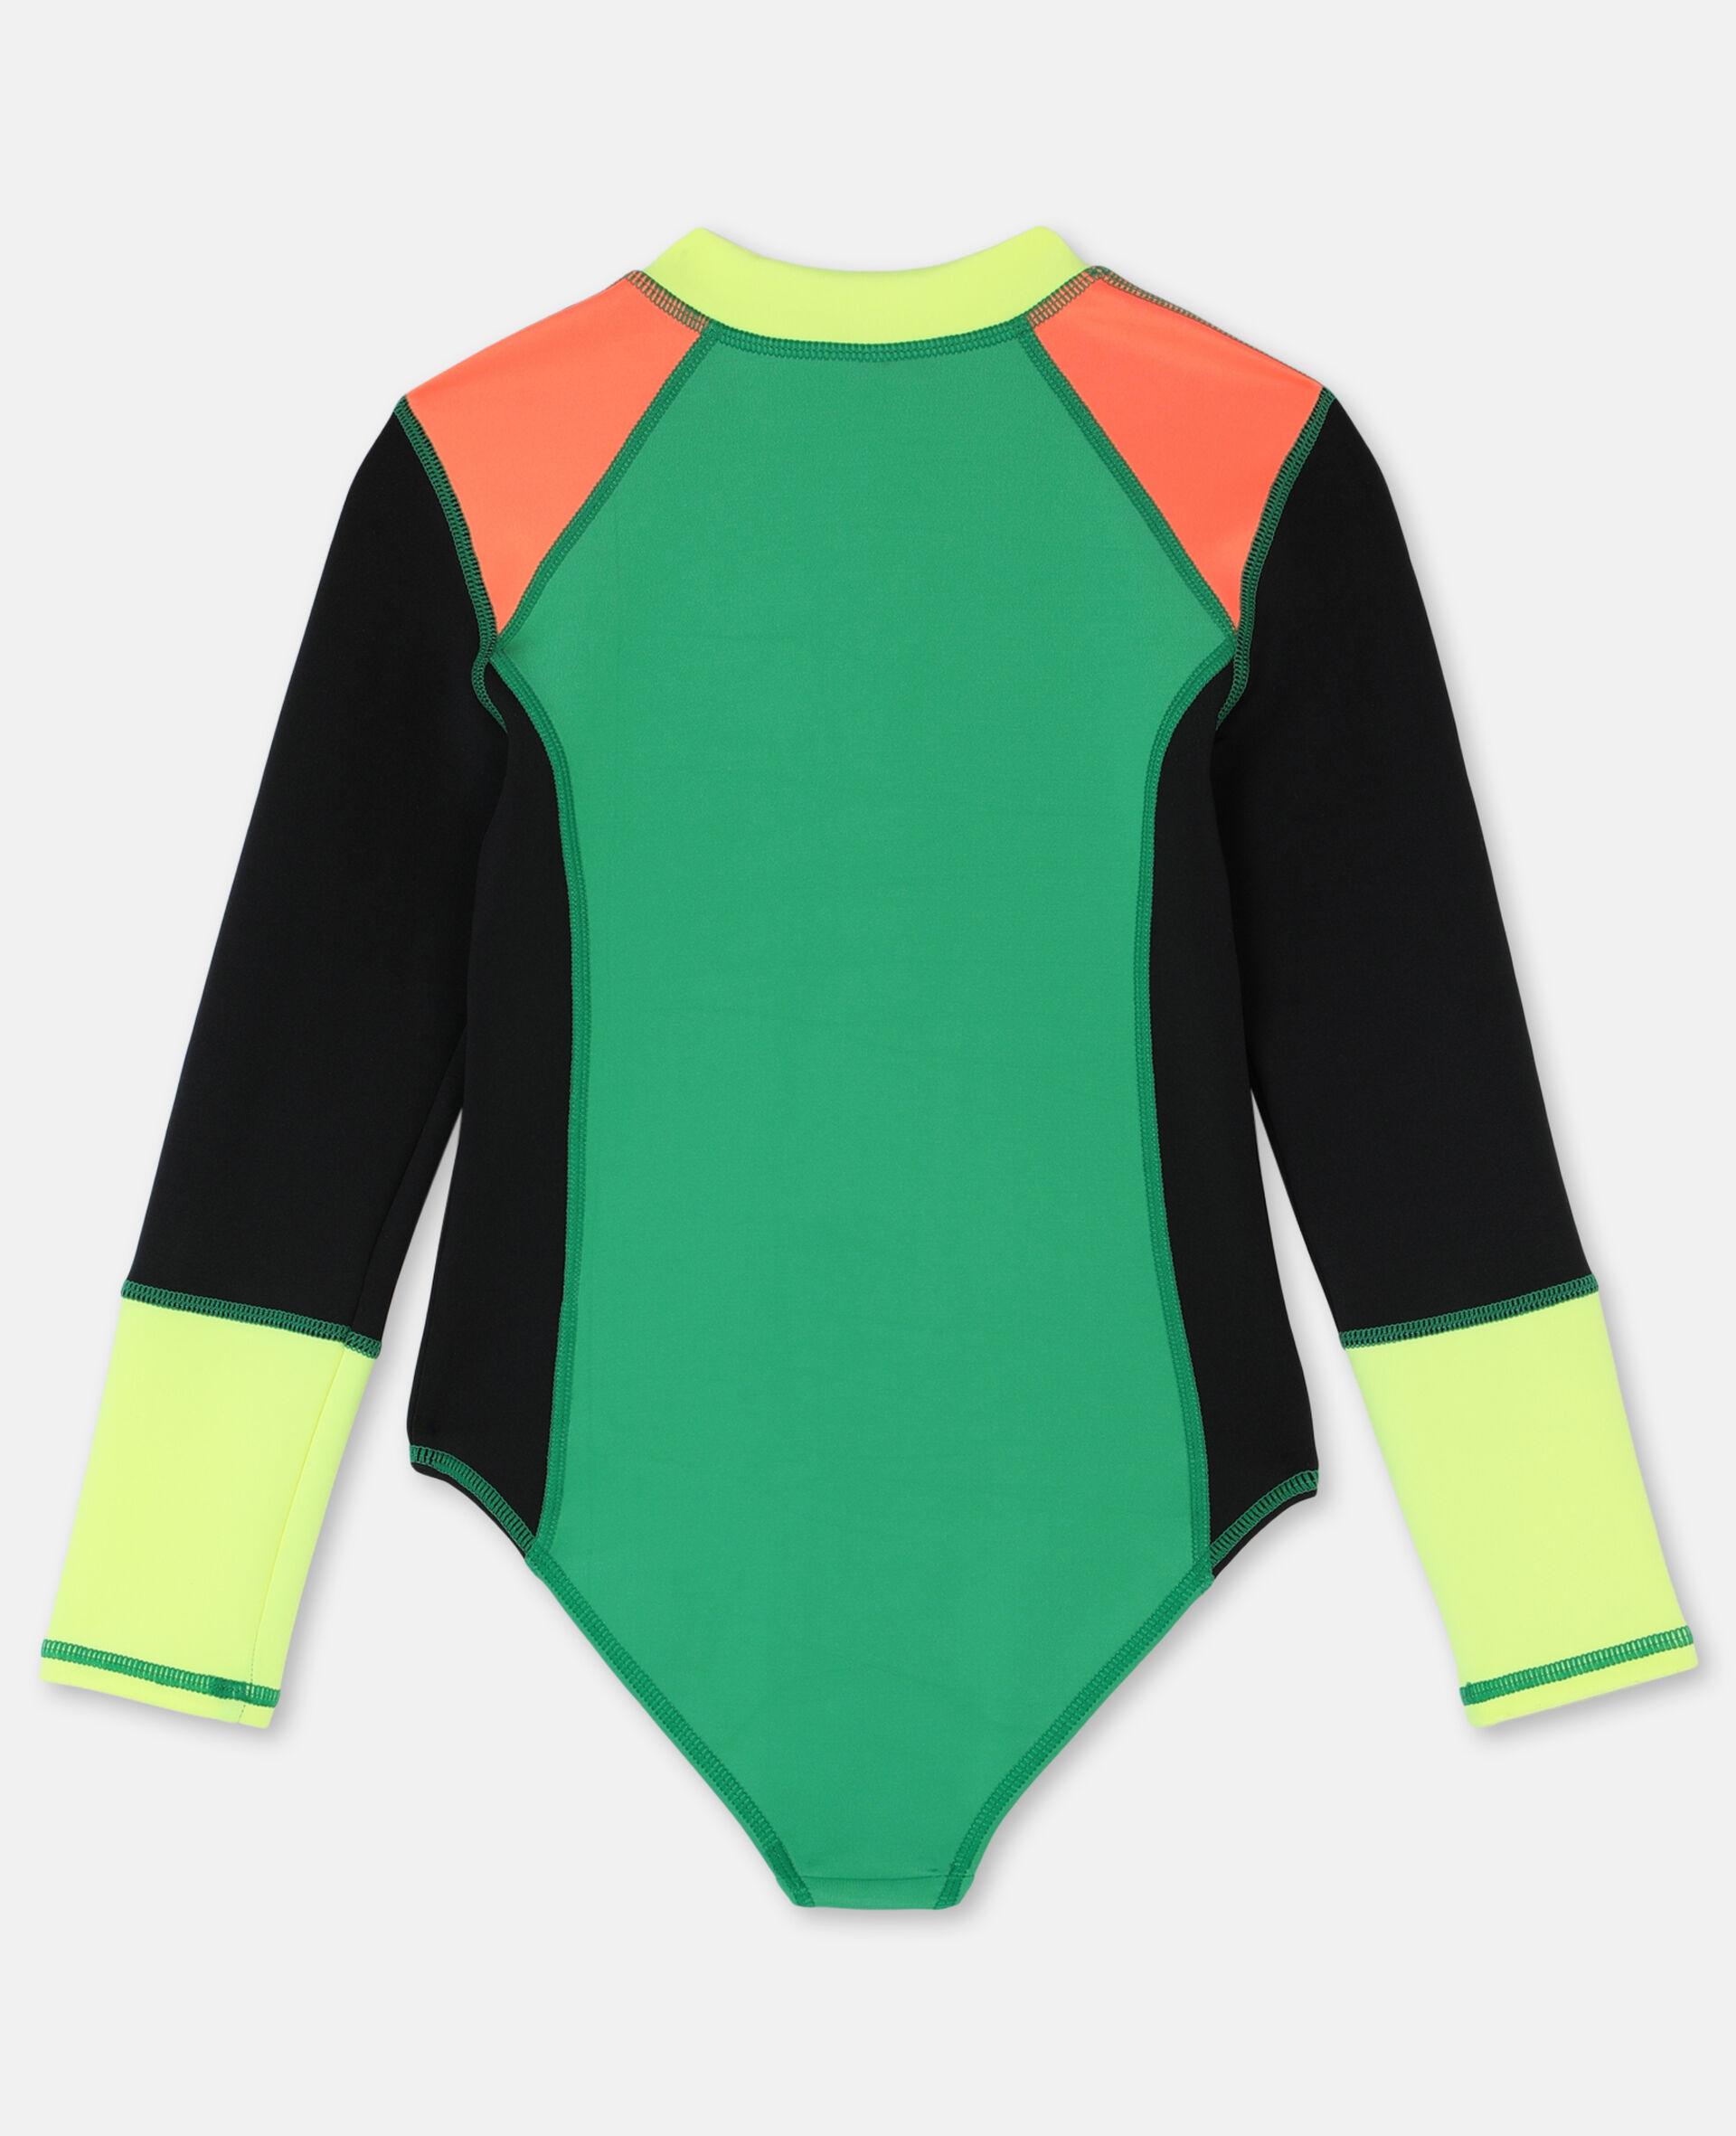 Multicolour Scuba Swimsuit-Multicolour-large image number 4